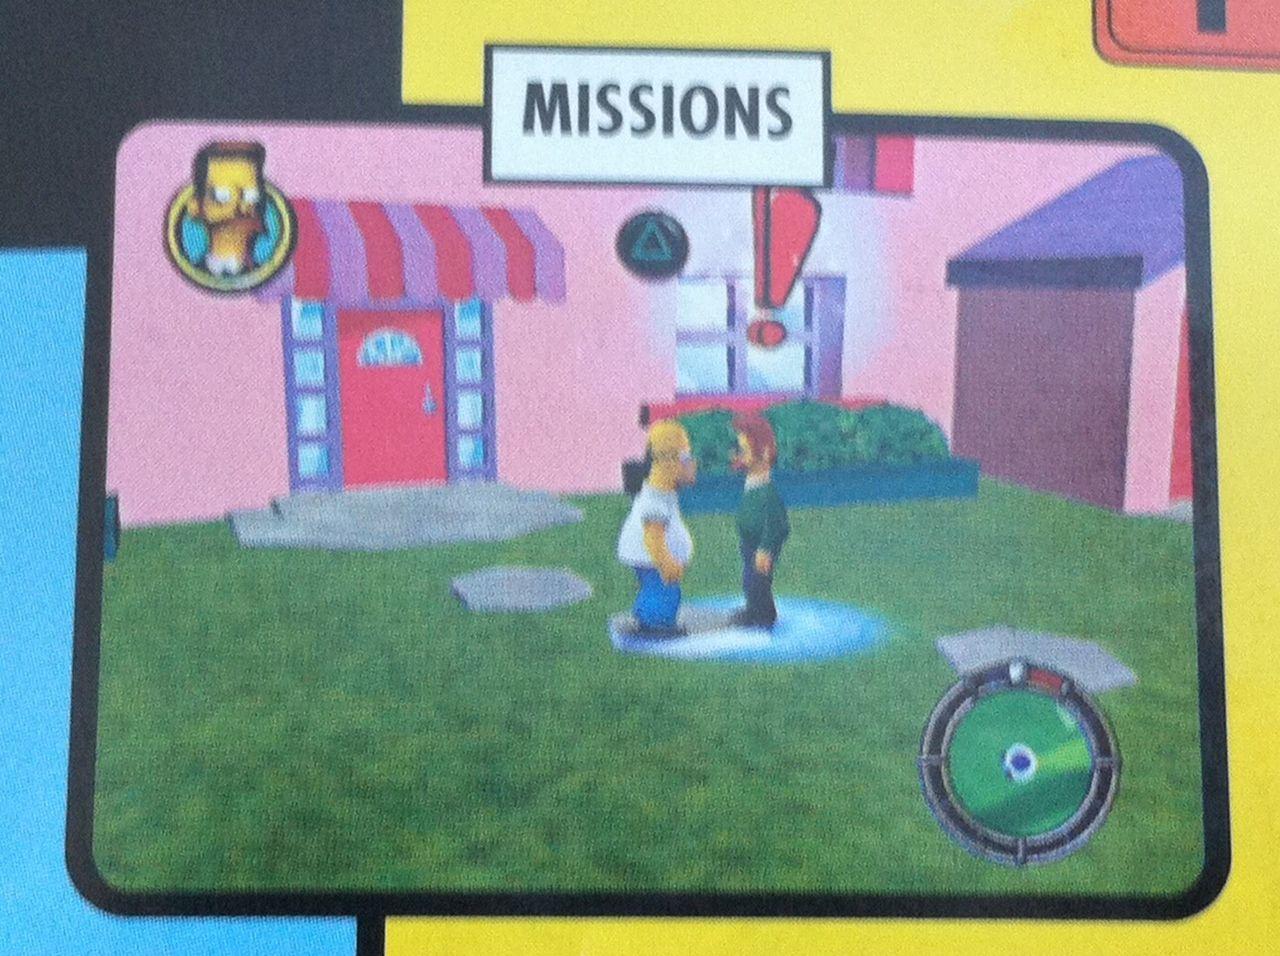 Simpsons Hit Amp Run Beta PS2 XBOX GameCube Unseen64